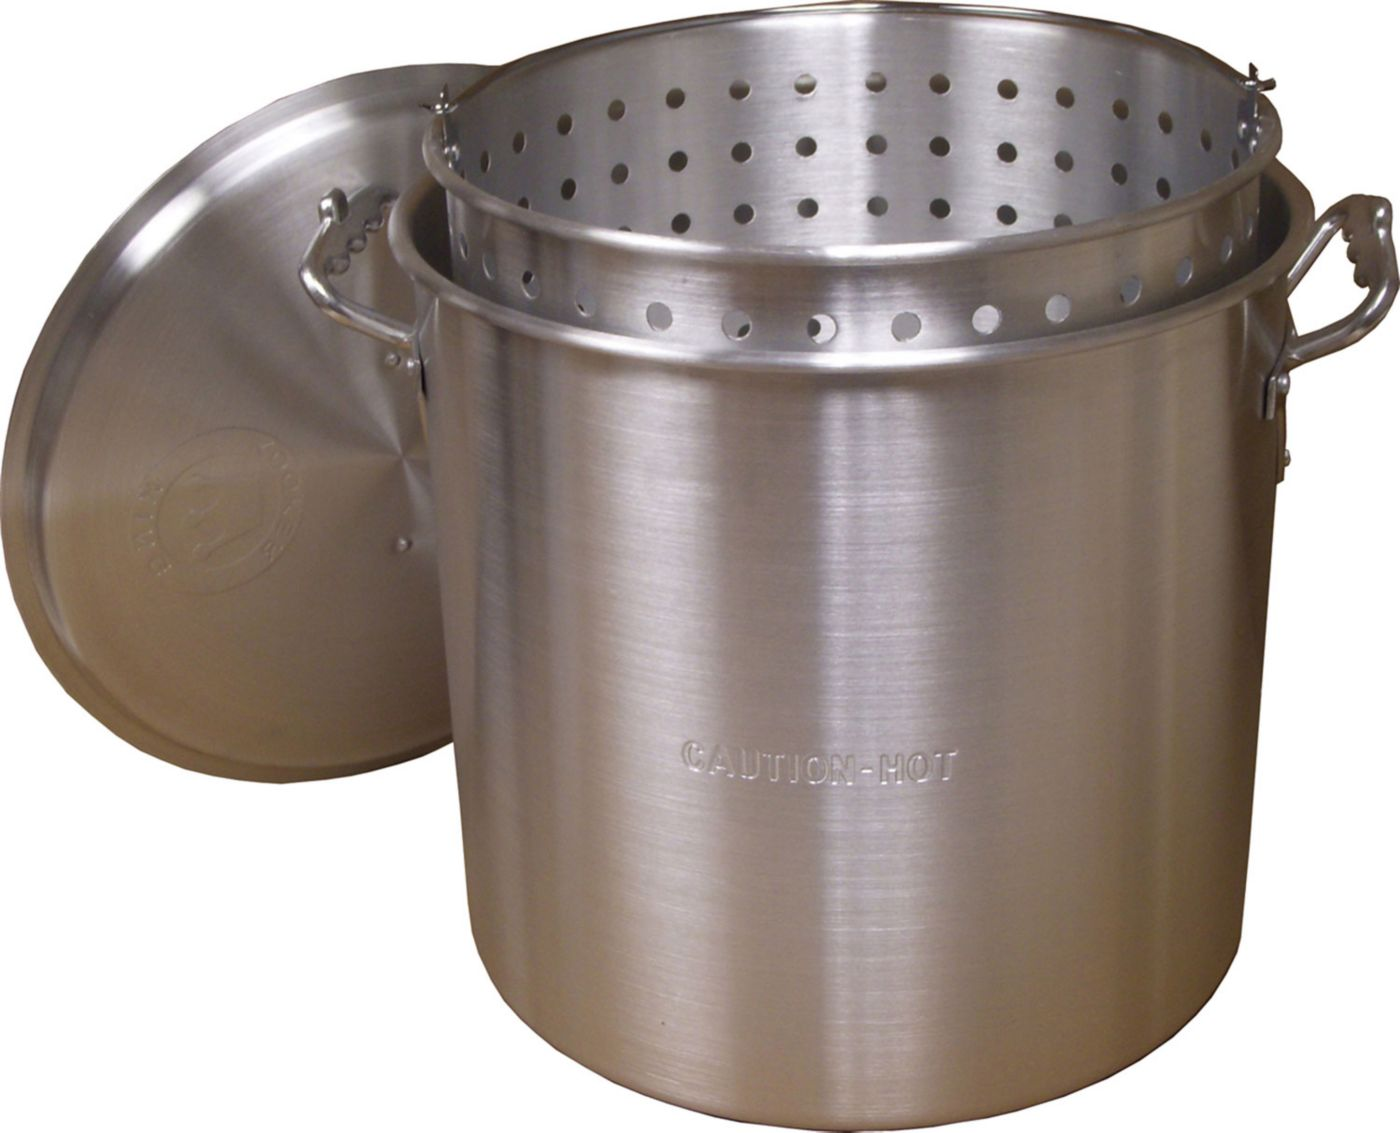 King Kooker 22 Quart Aluminum Pot with Basket and Lid